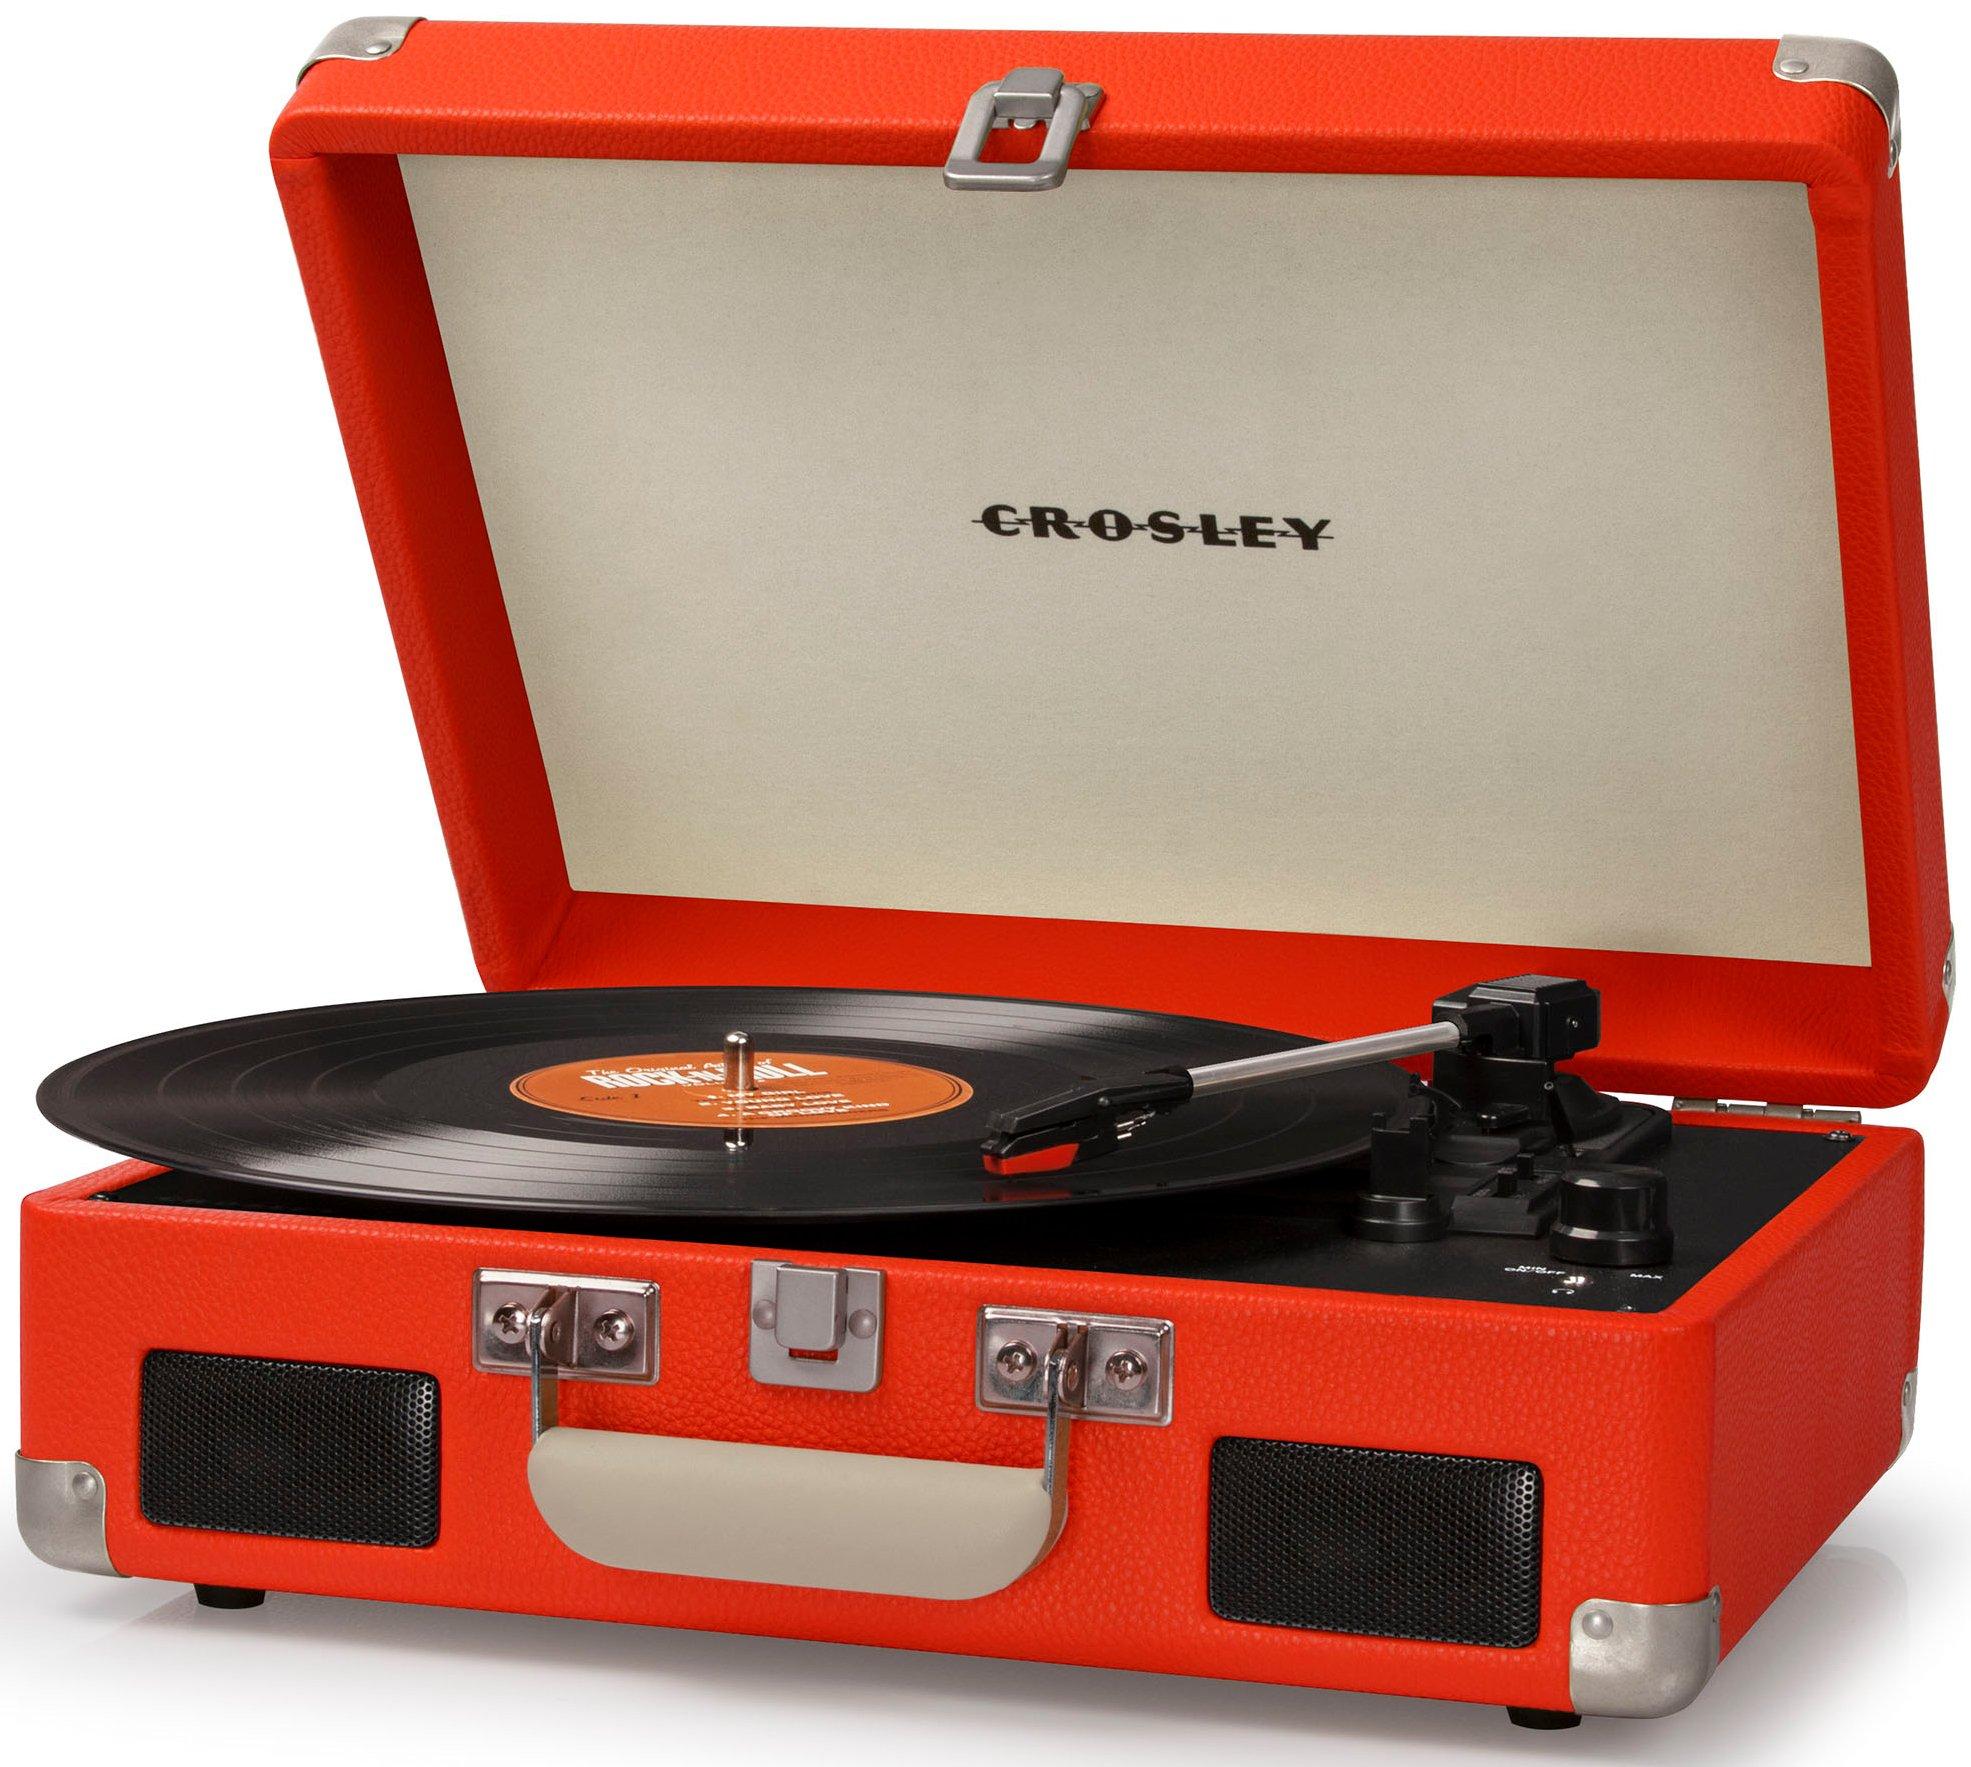 Crosley CR8005C-OR Cruiser II Portable Battery Powered 3-Speed Turntable, Orange by Crosley (Image #1)